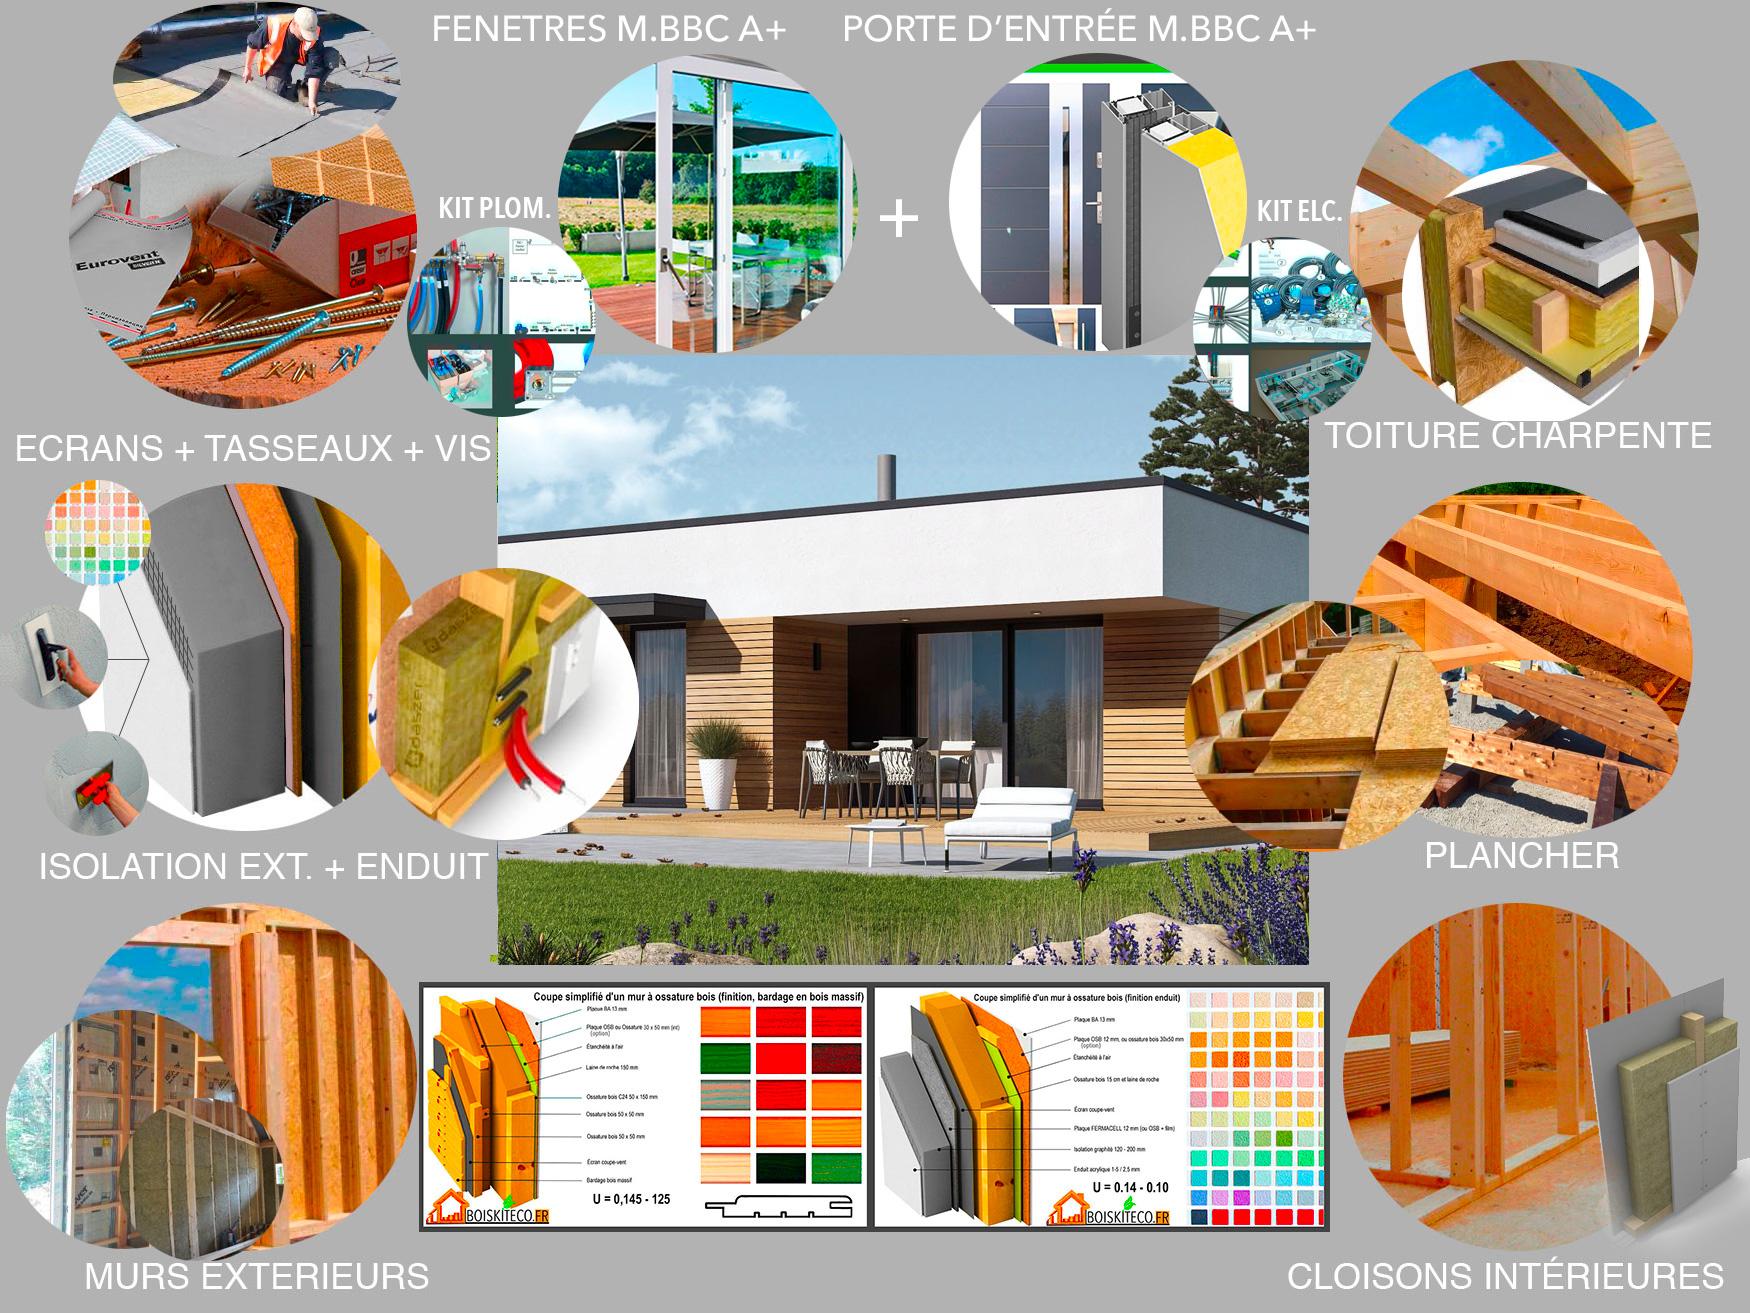 Maison bois kit MINI 1 MODERN